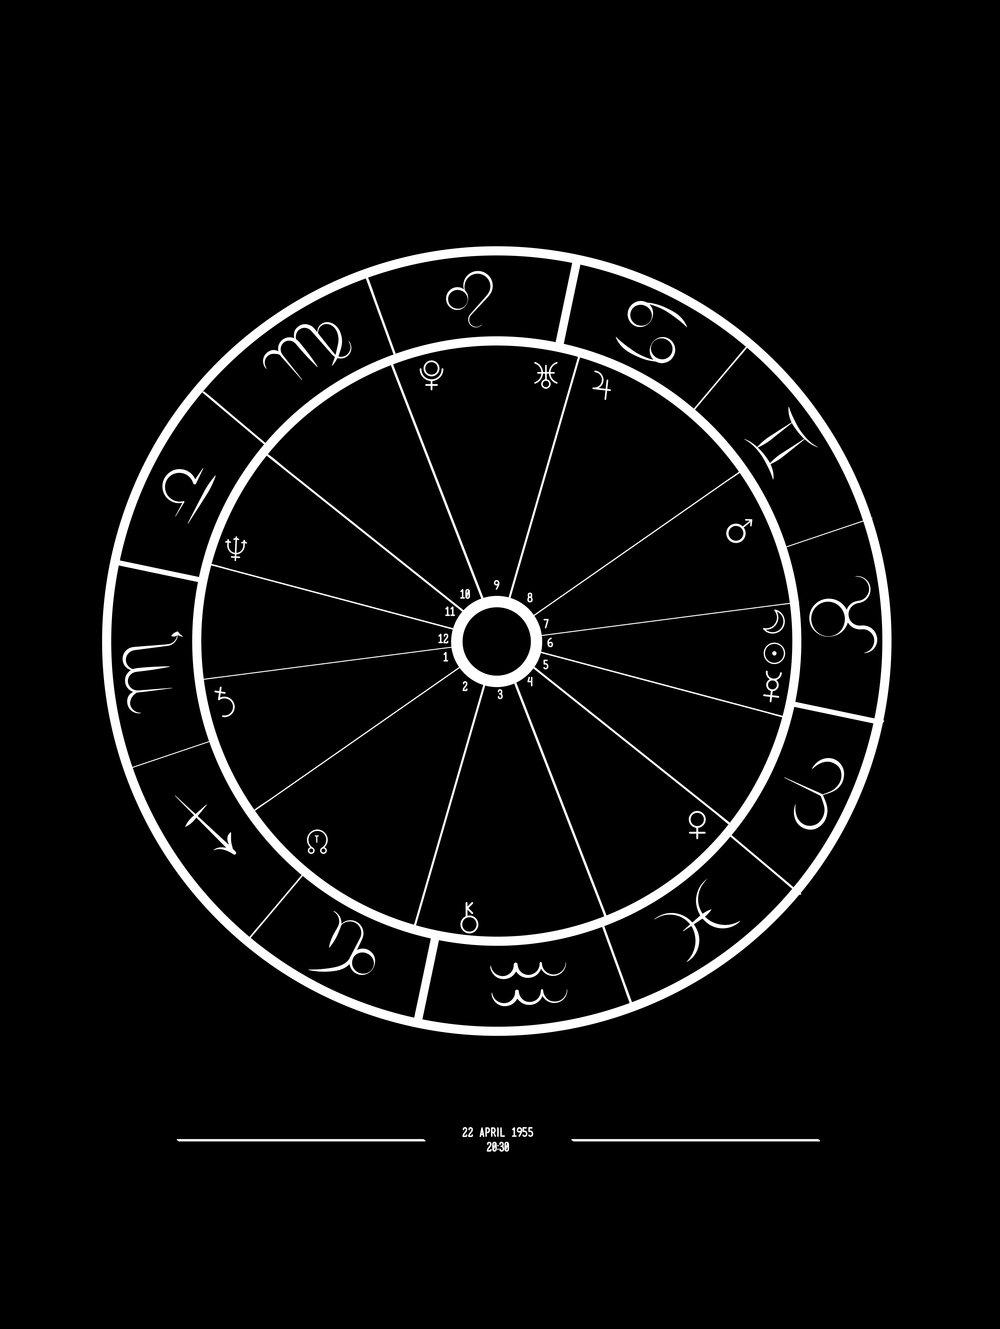 diana chart.jpg